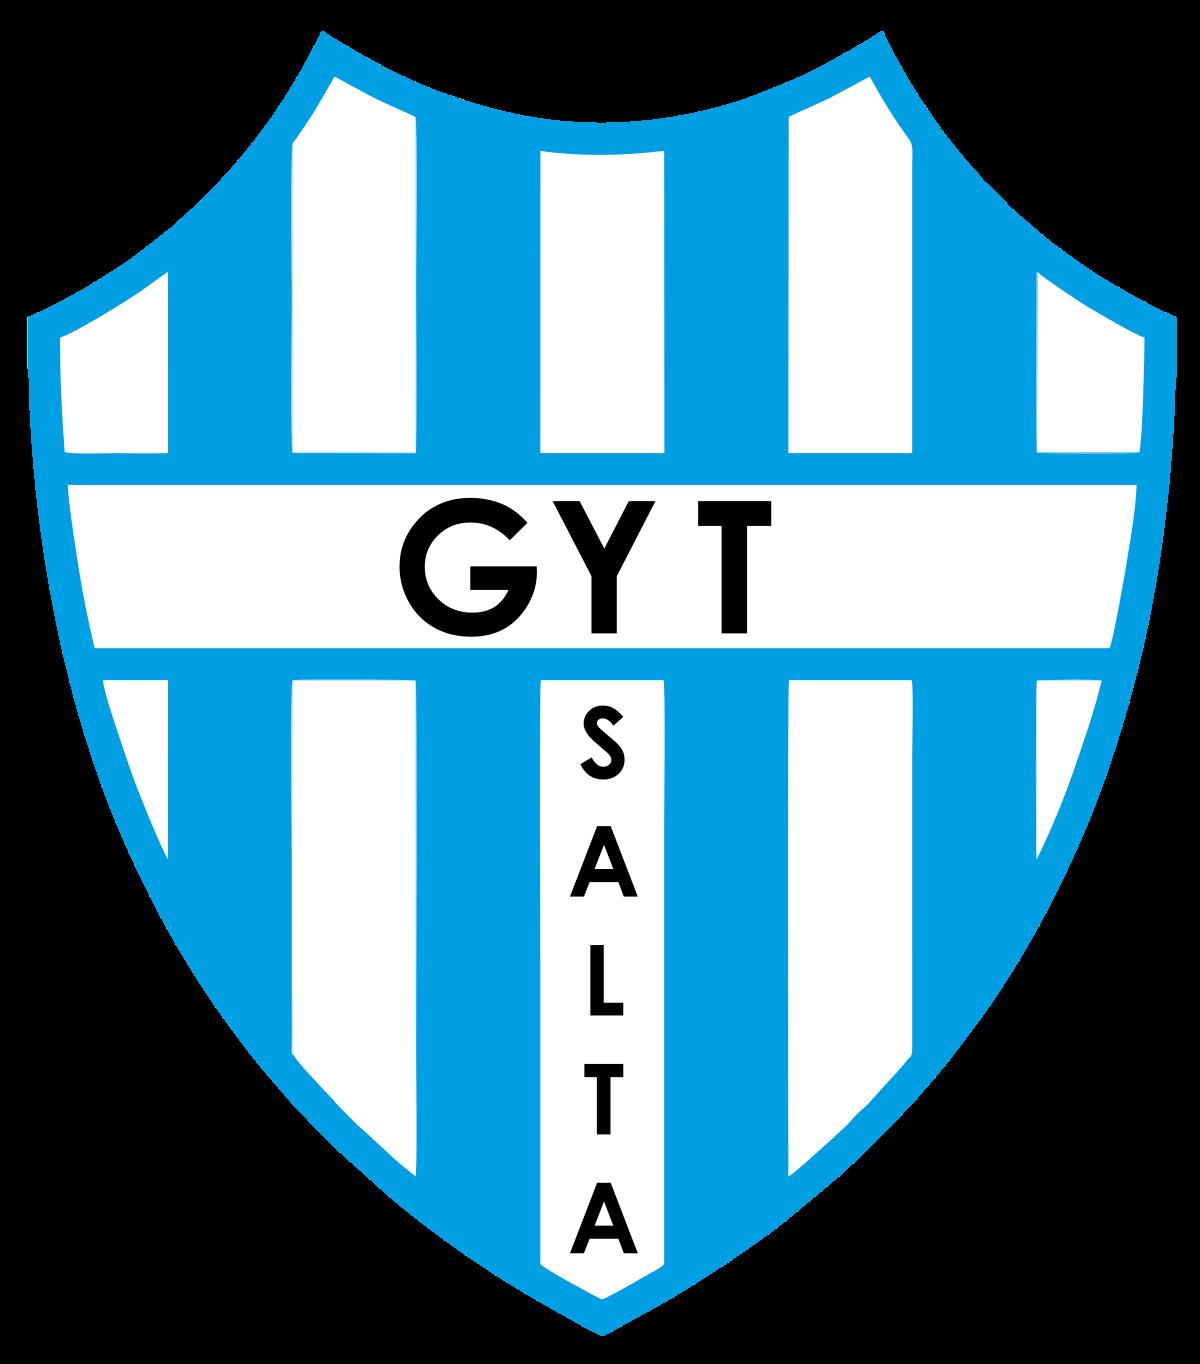 Gimnasia y Tiro logo